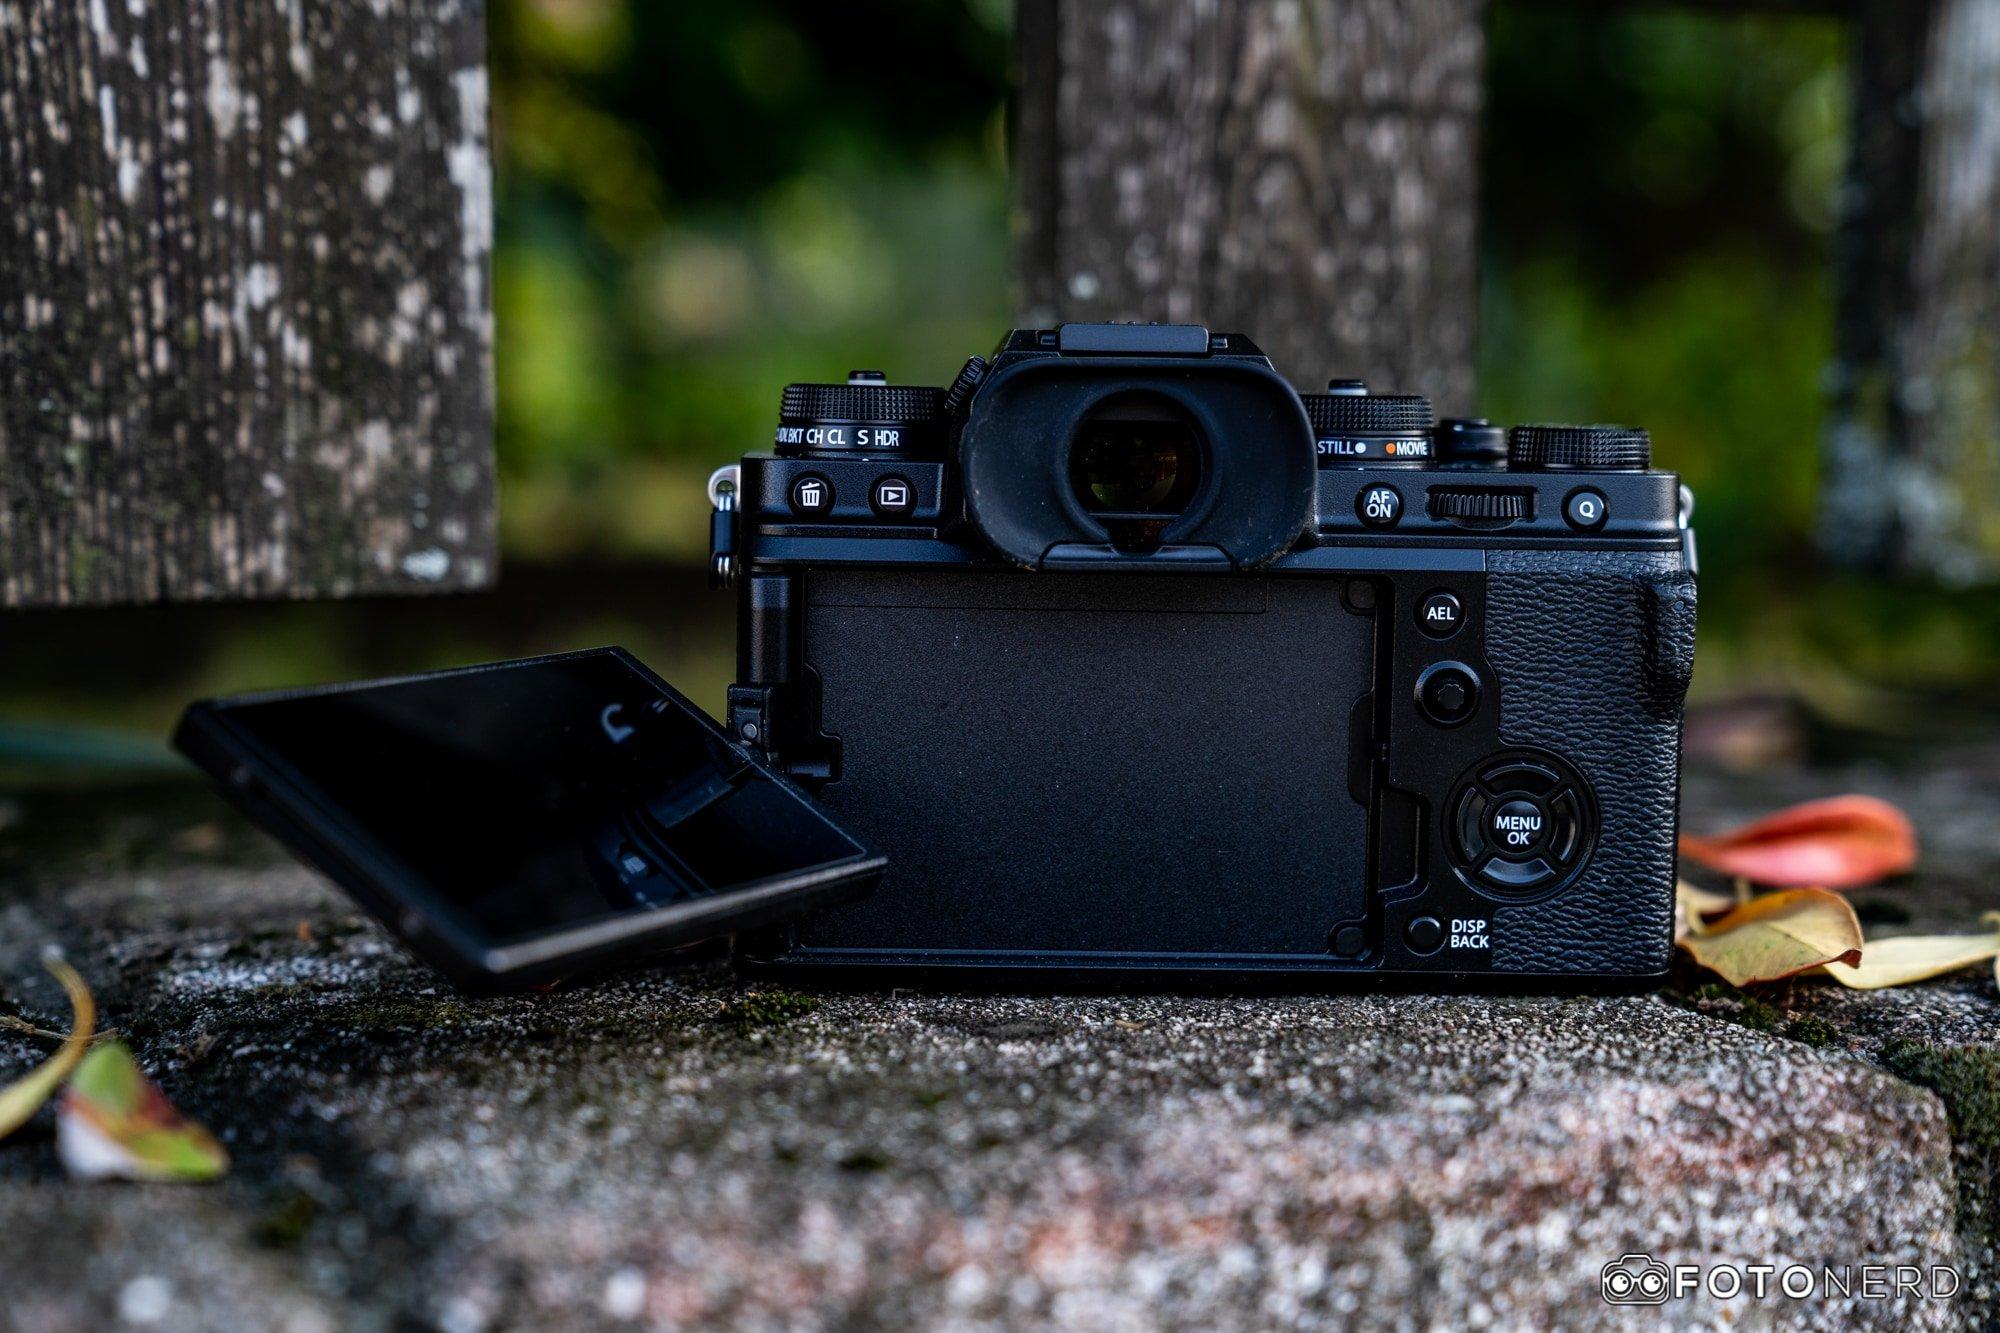 Fotocamere con display orientabile